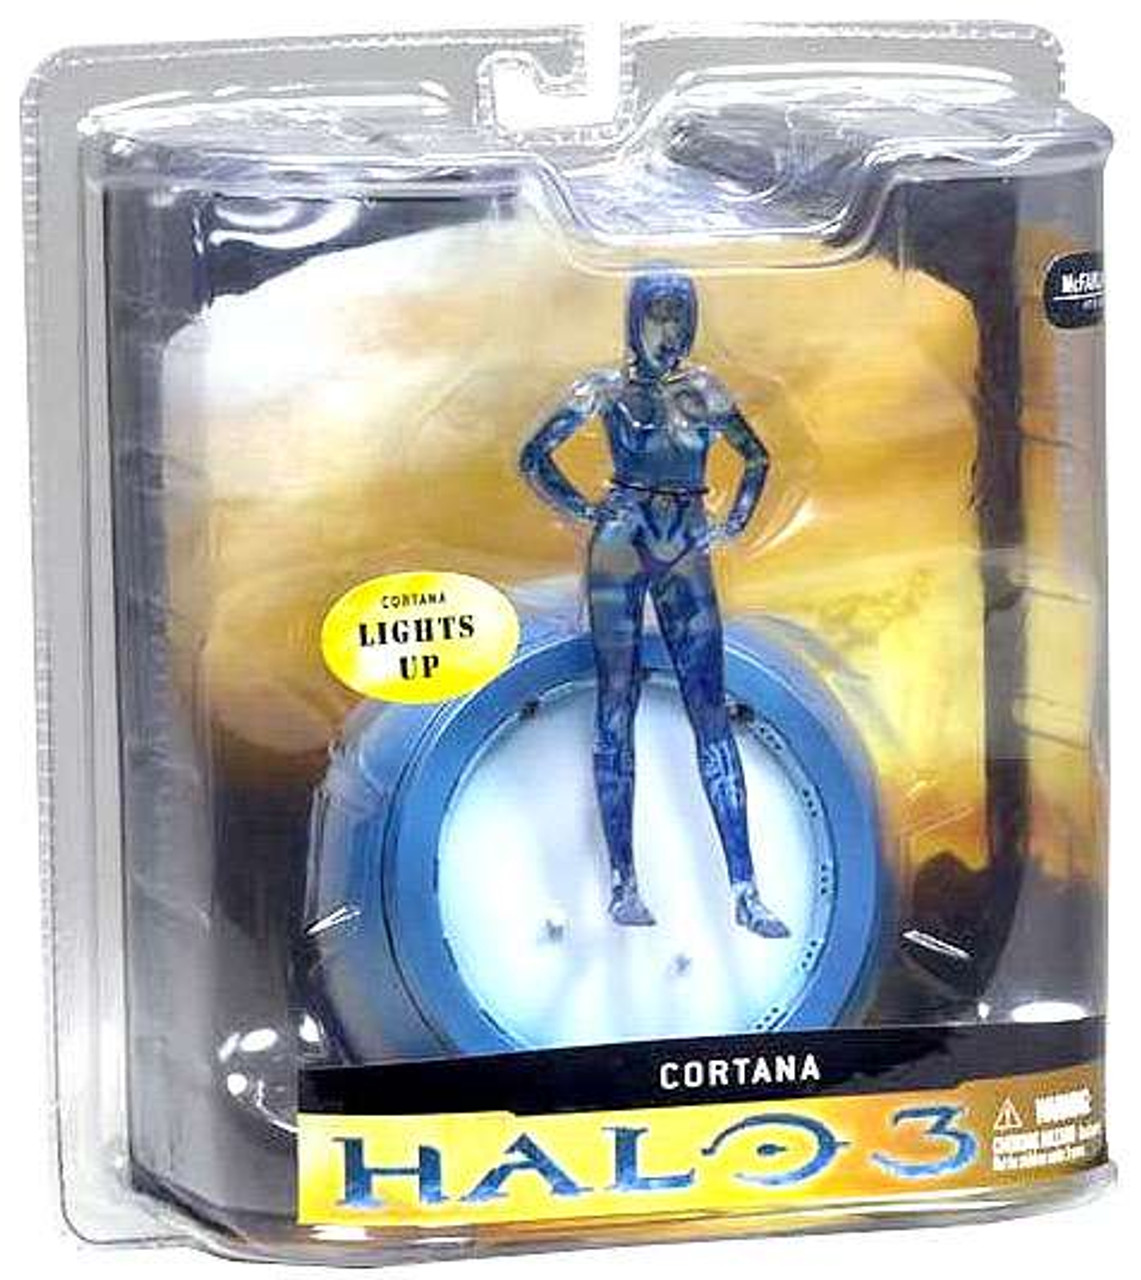 McFarlane Toys Halo 3 Cortana Action Figure [Transparent]